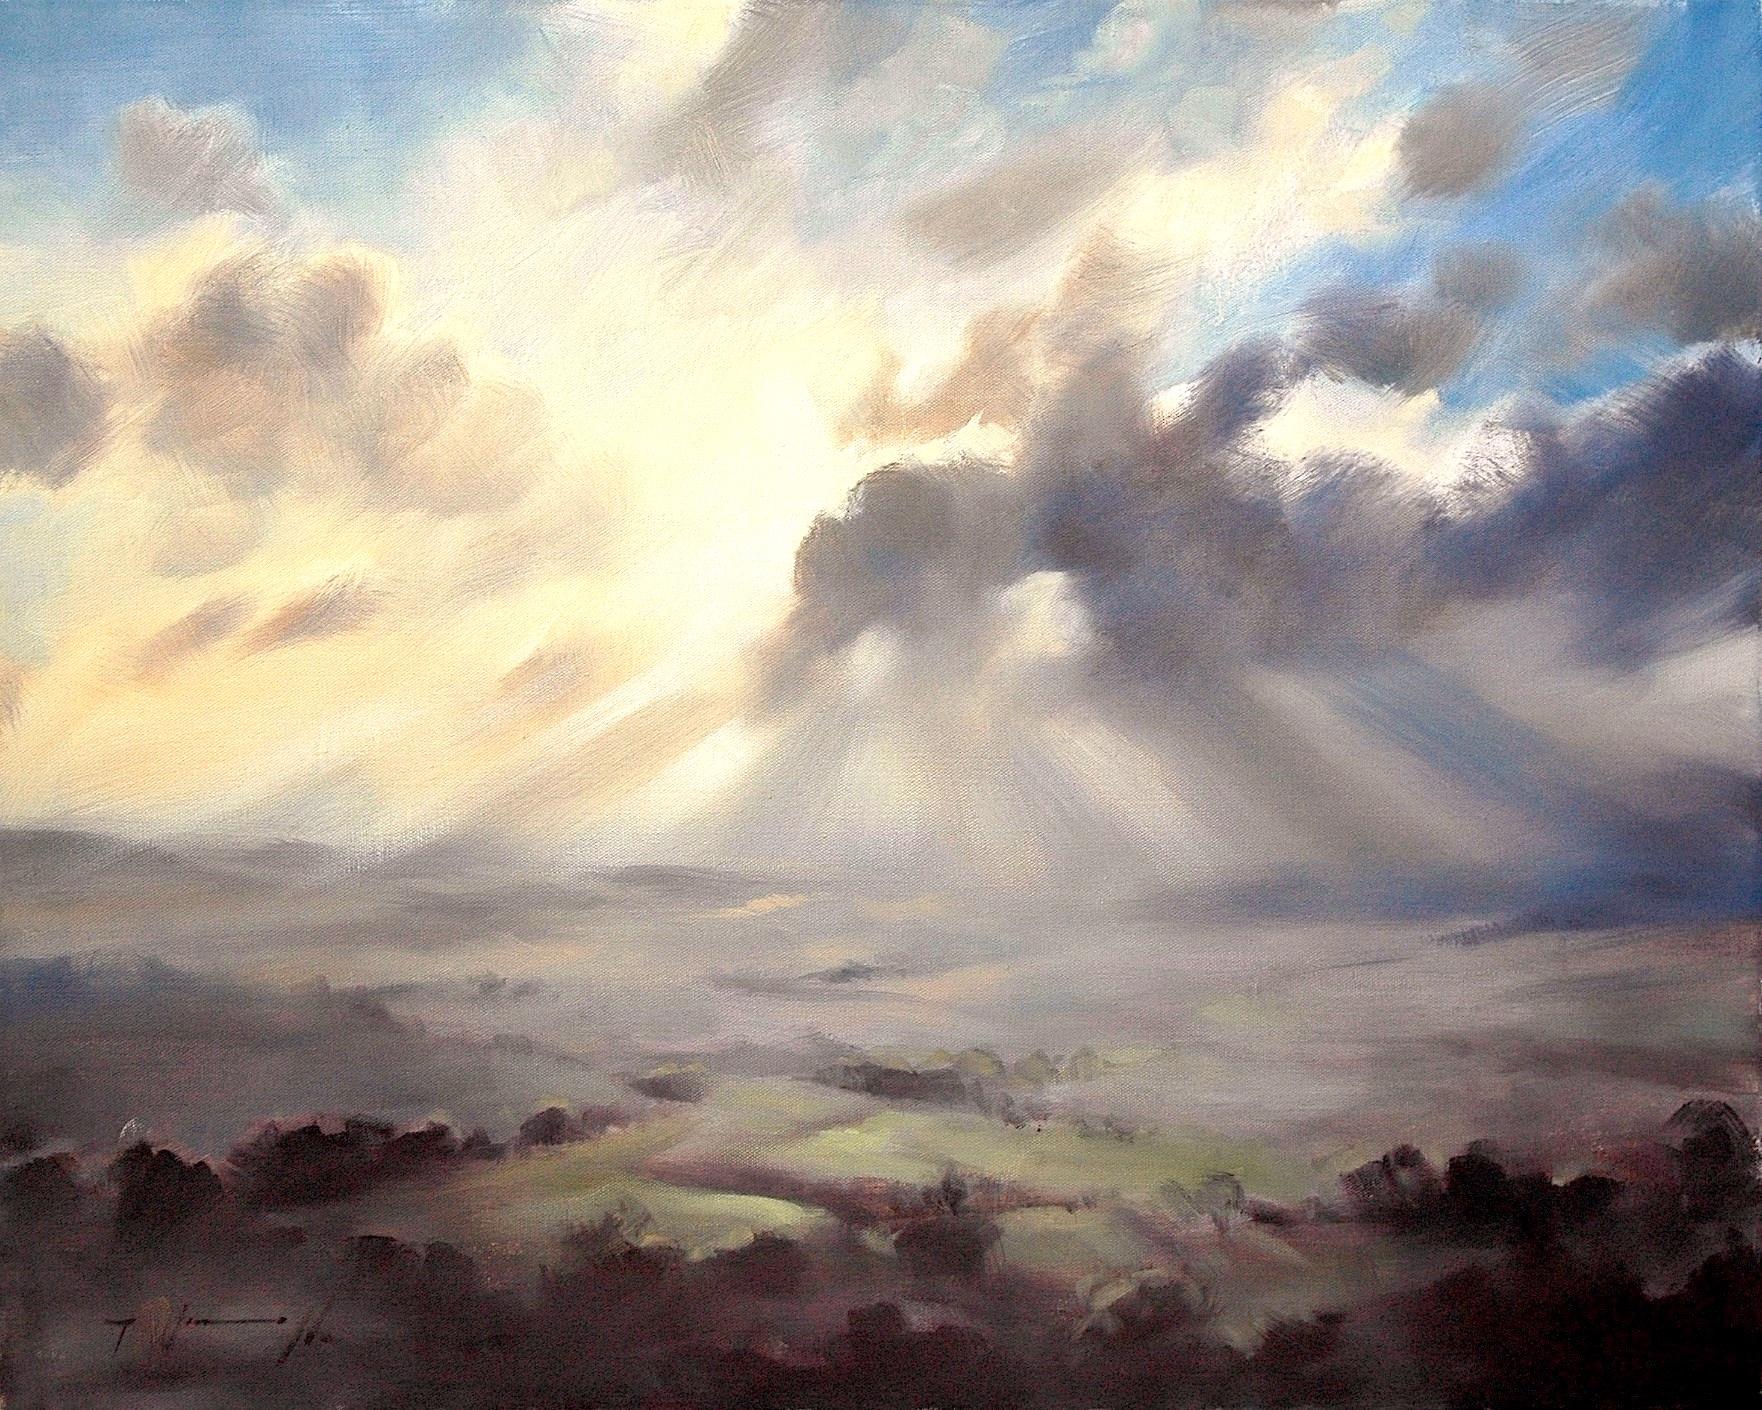 1762x1410 Landscape Painting By International Artist Trevor Waugh